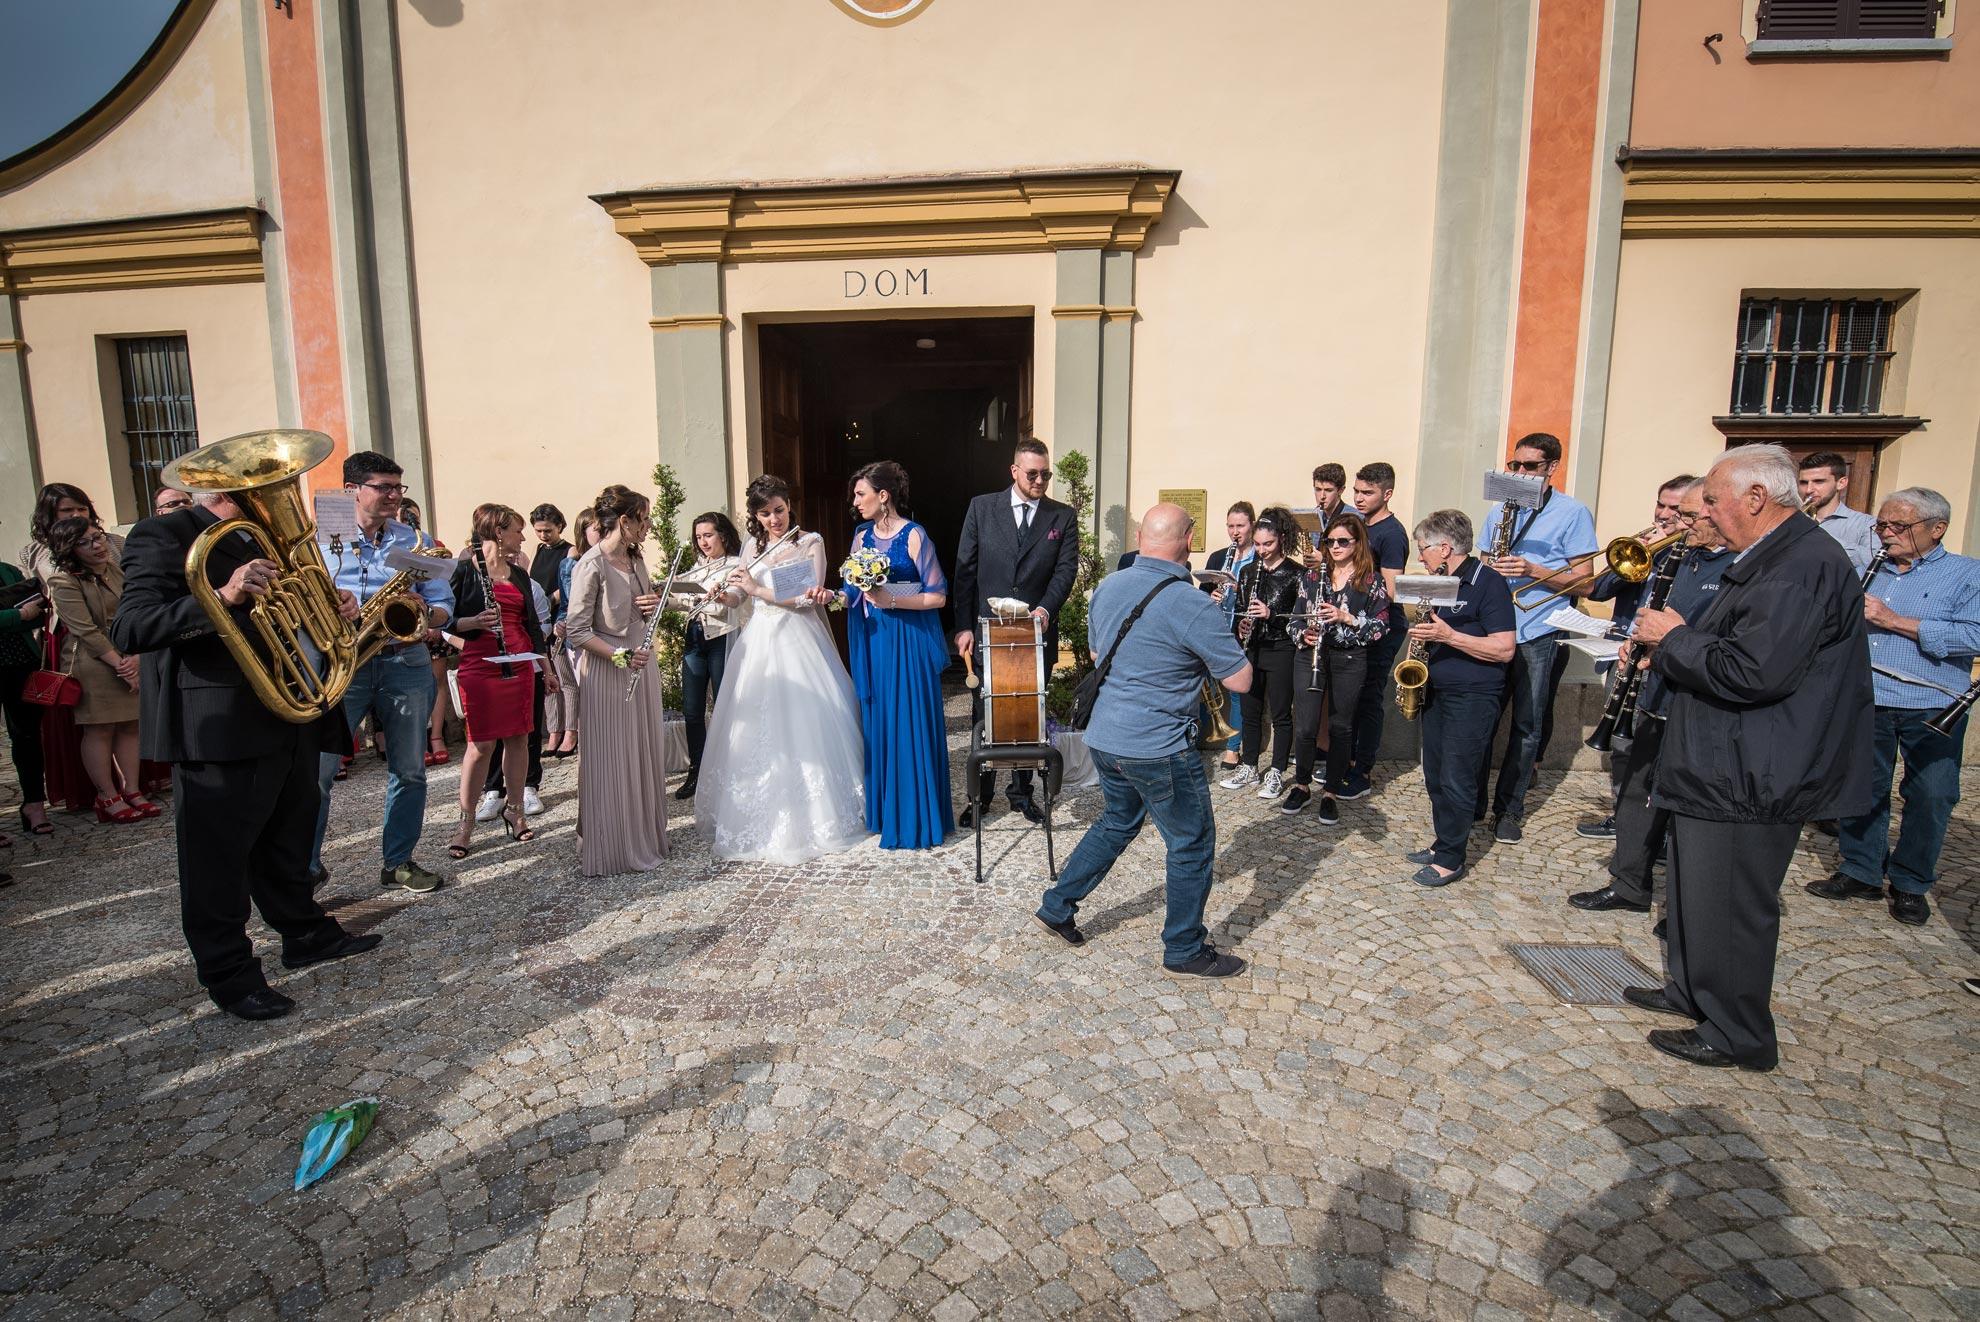 Matrimonio a Narzole Lorenza Diego - DSC 0609 - Fotografo matrimonio in Piemonte - Fotografo matrimonio in Piemonte